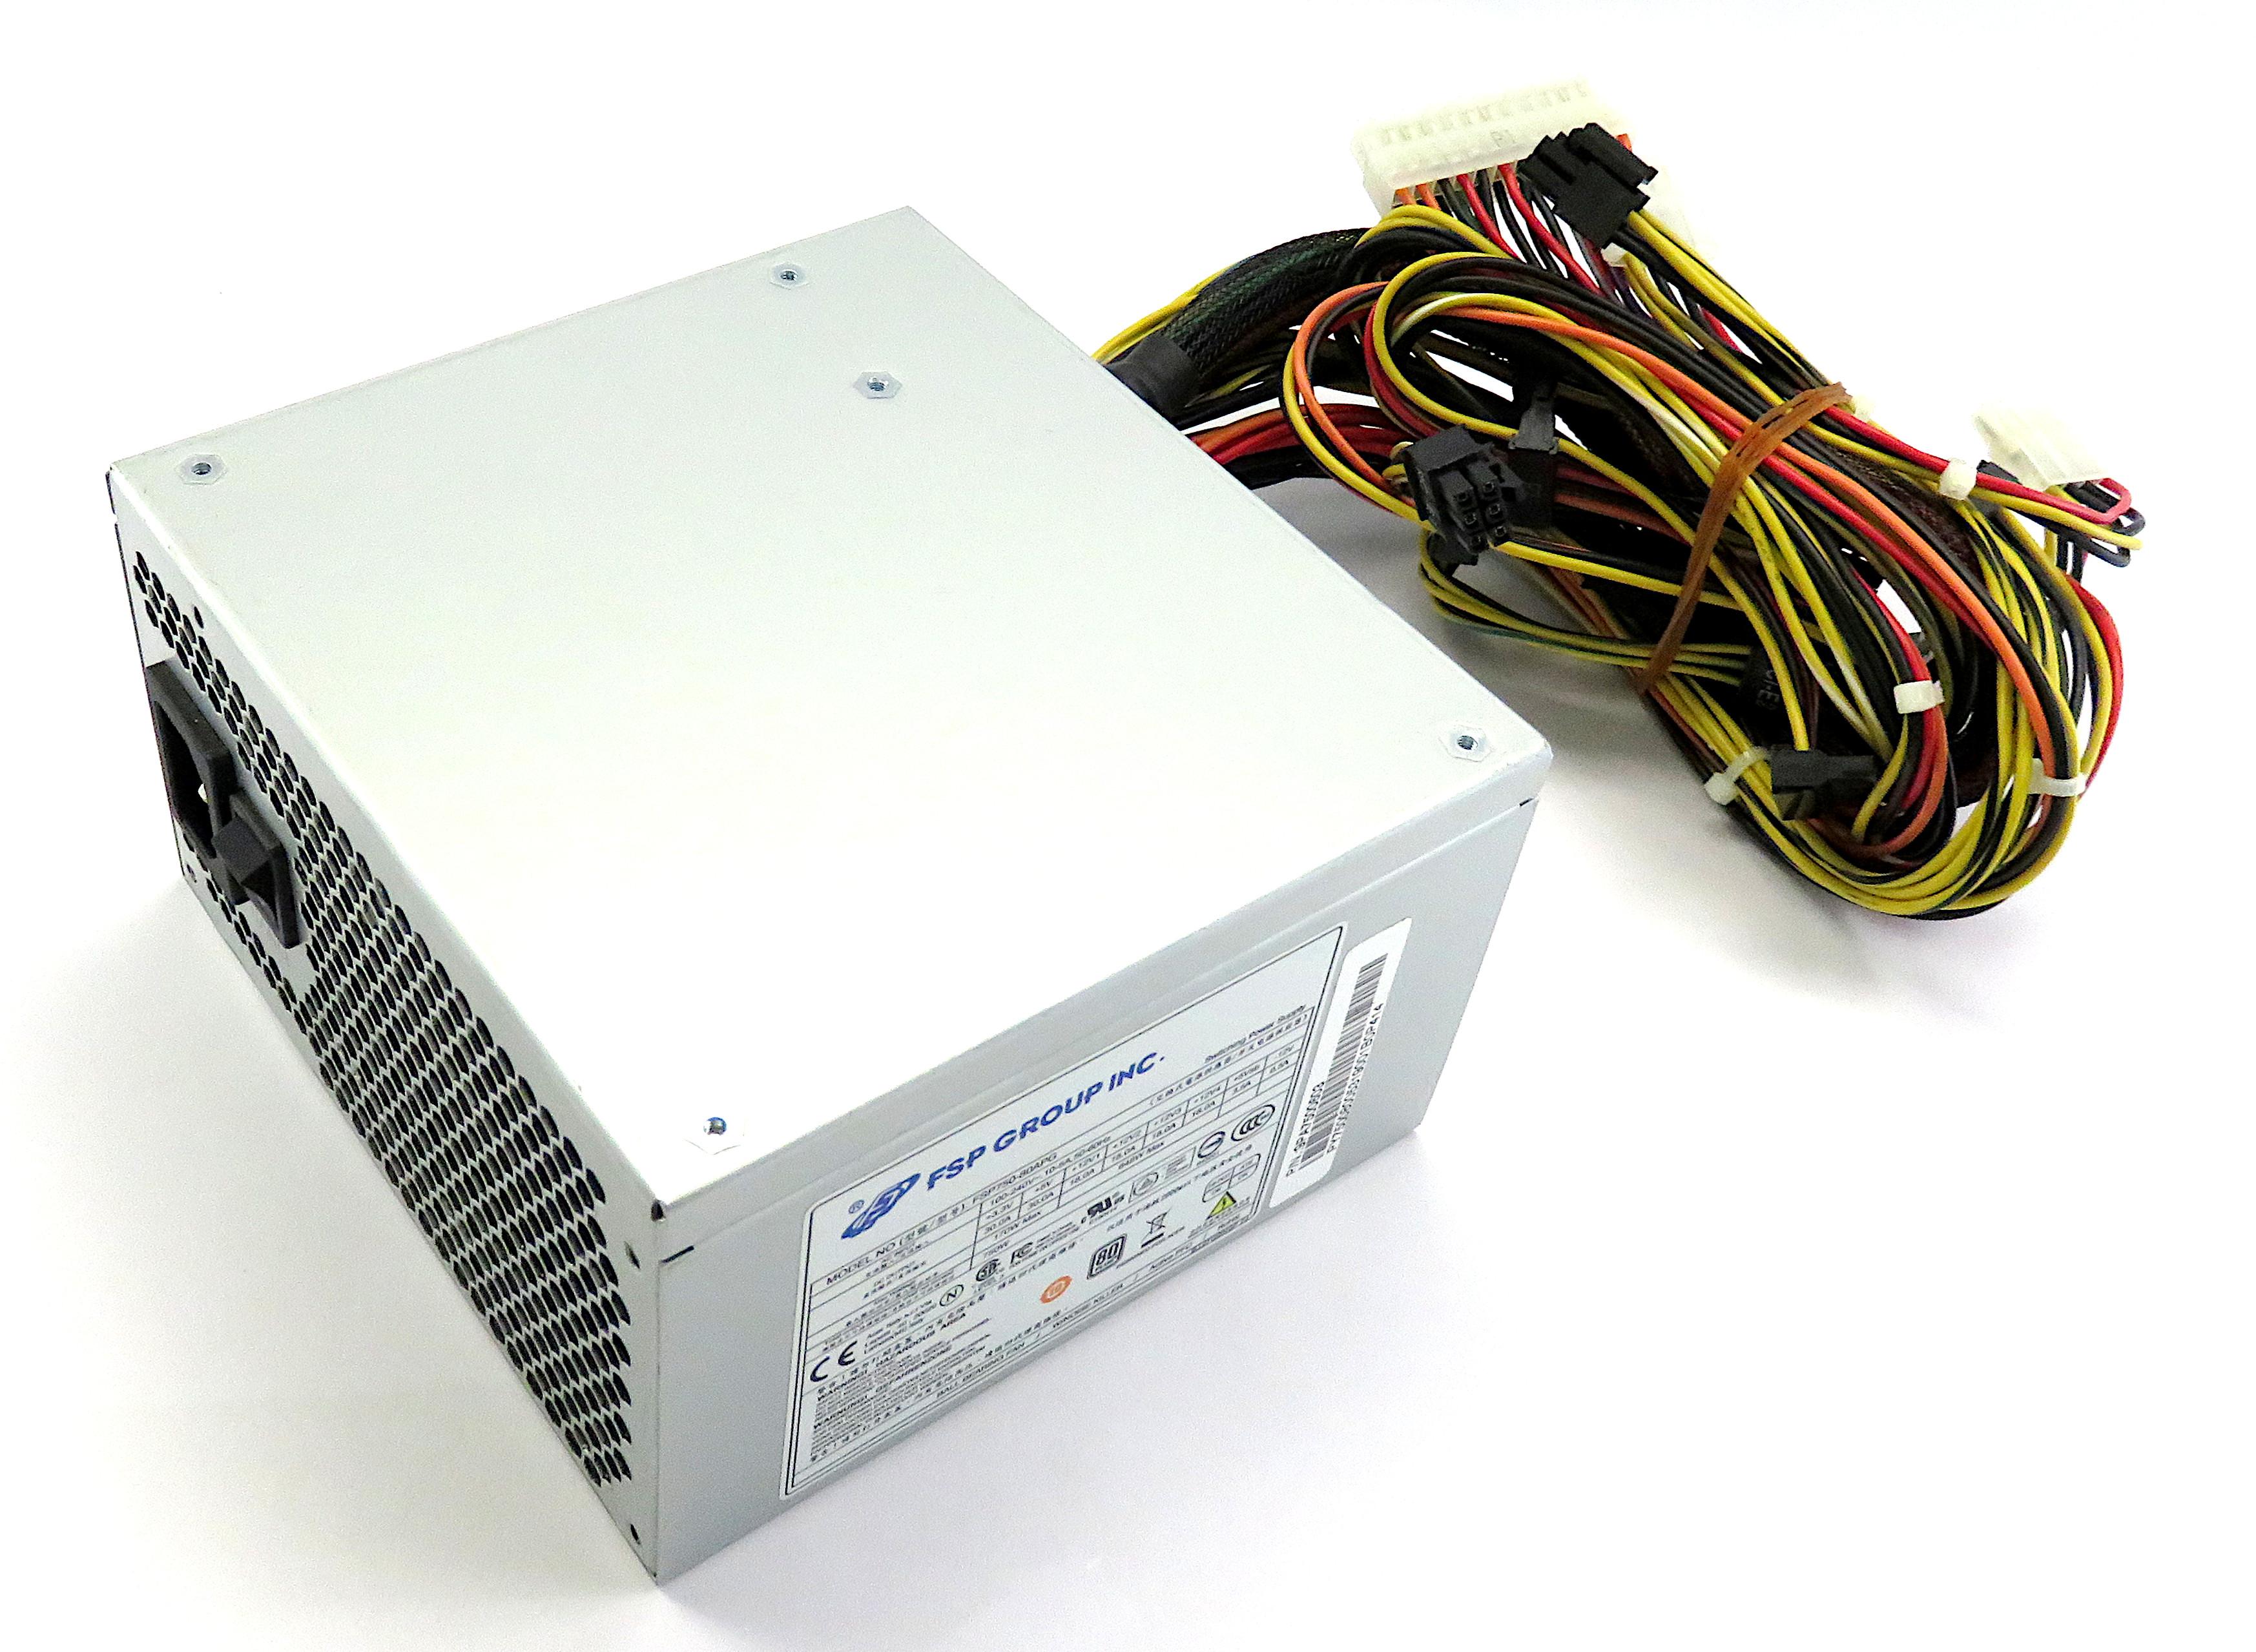 FSP750-80APG FSP Group 24pin 750w ATX PSU Power Supply Unit - 9PA7500601